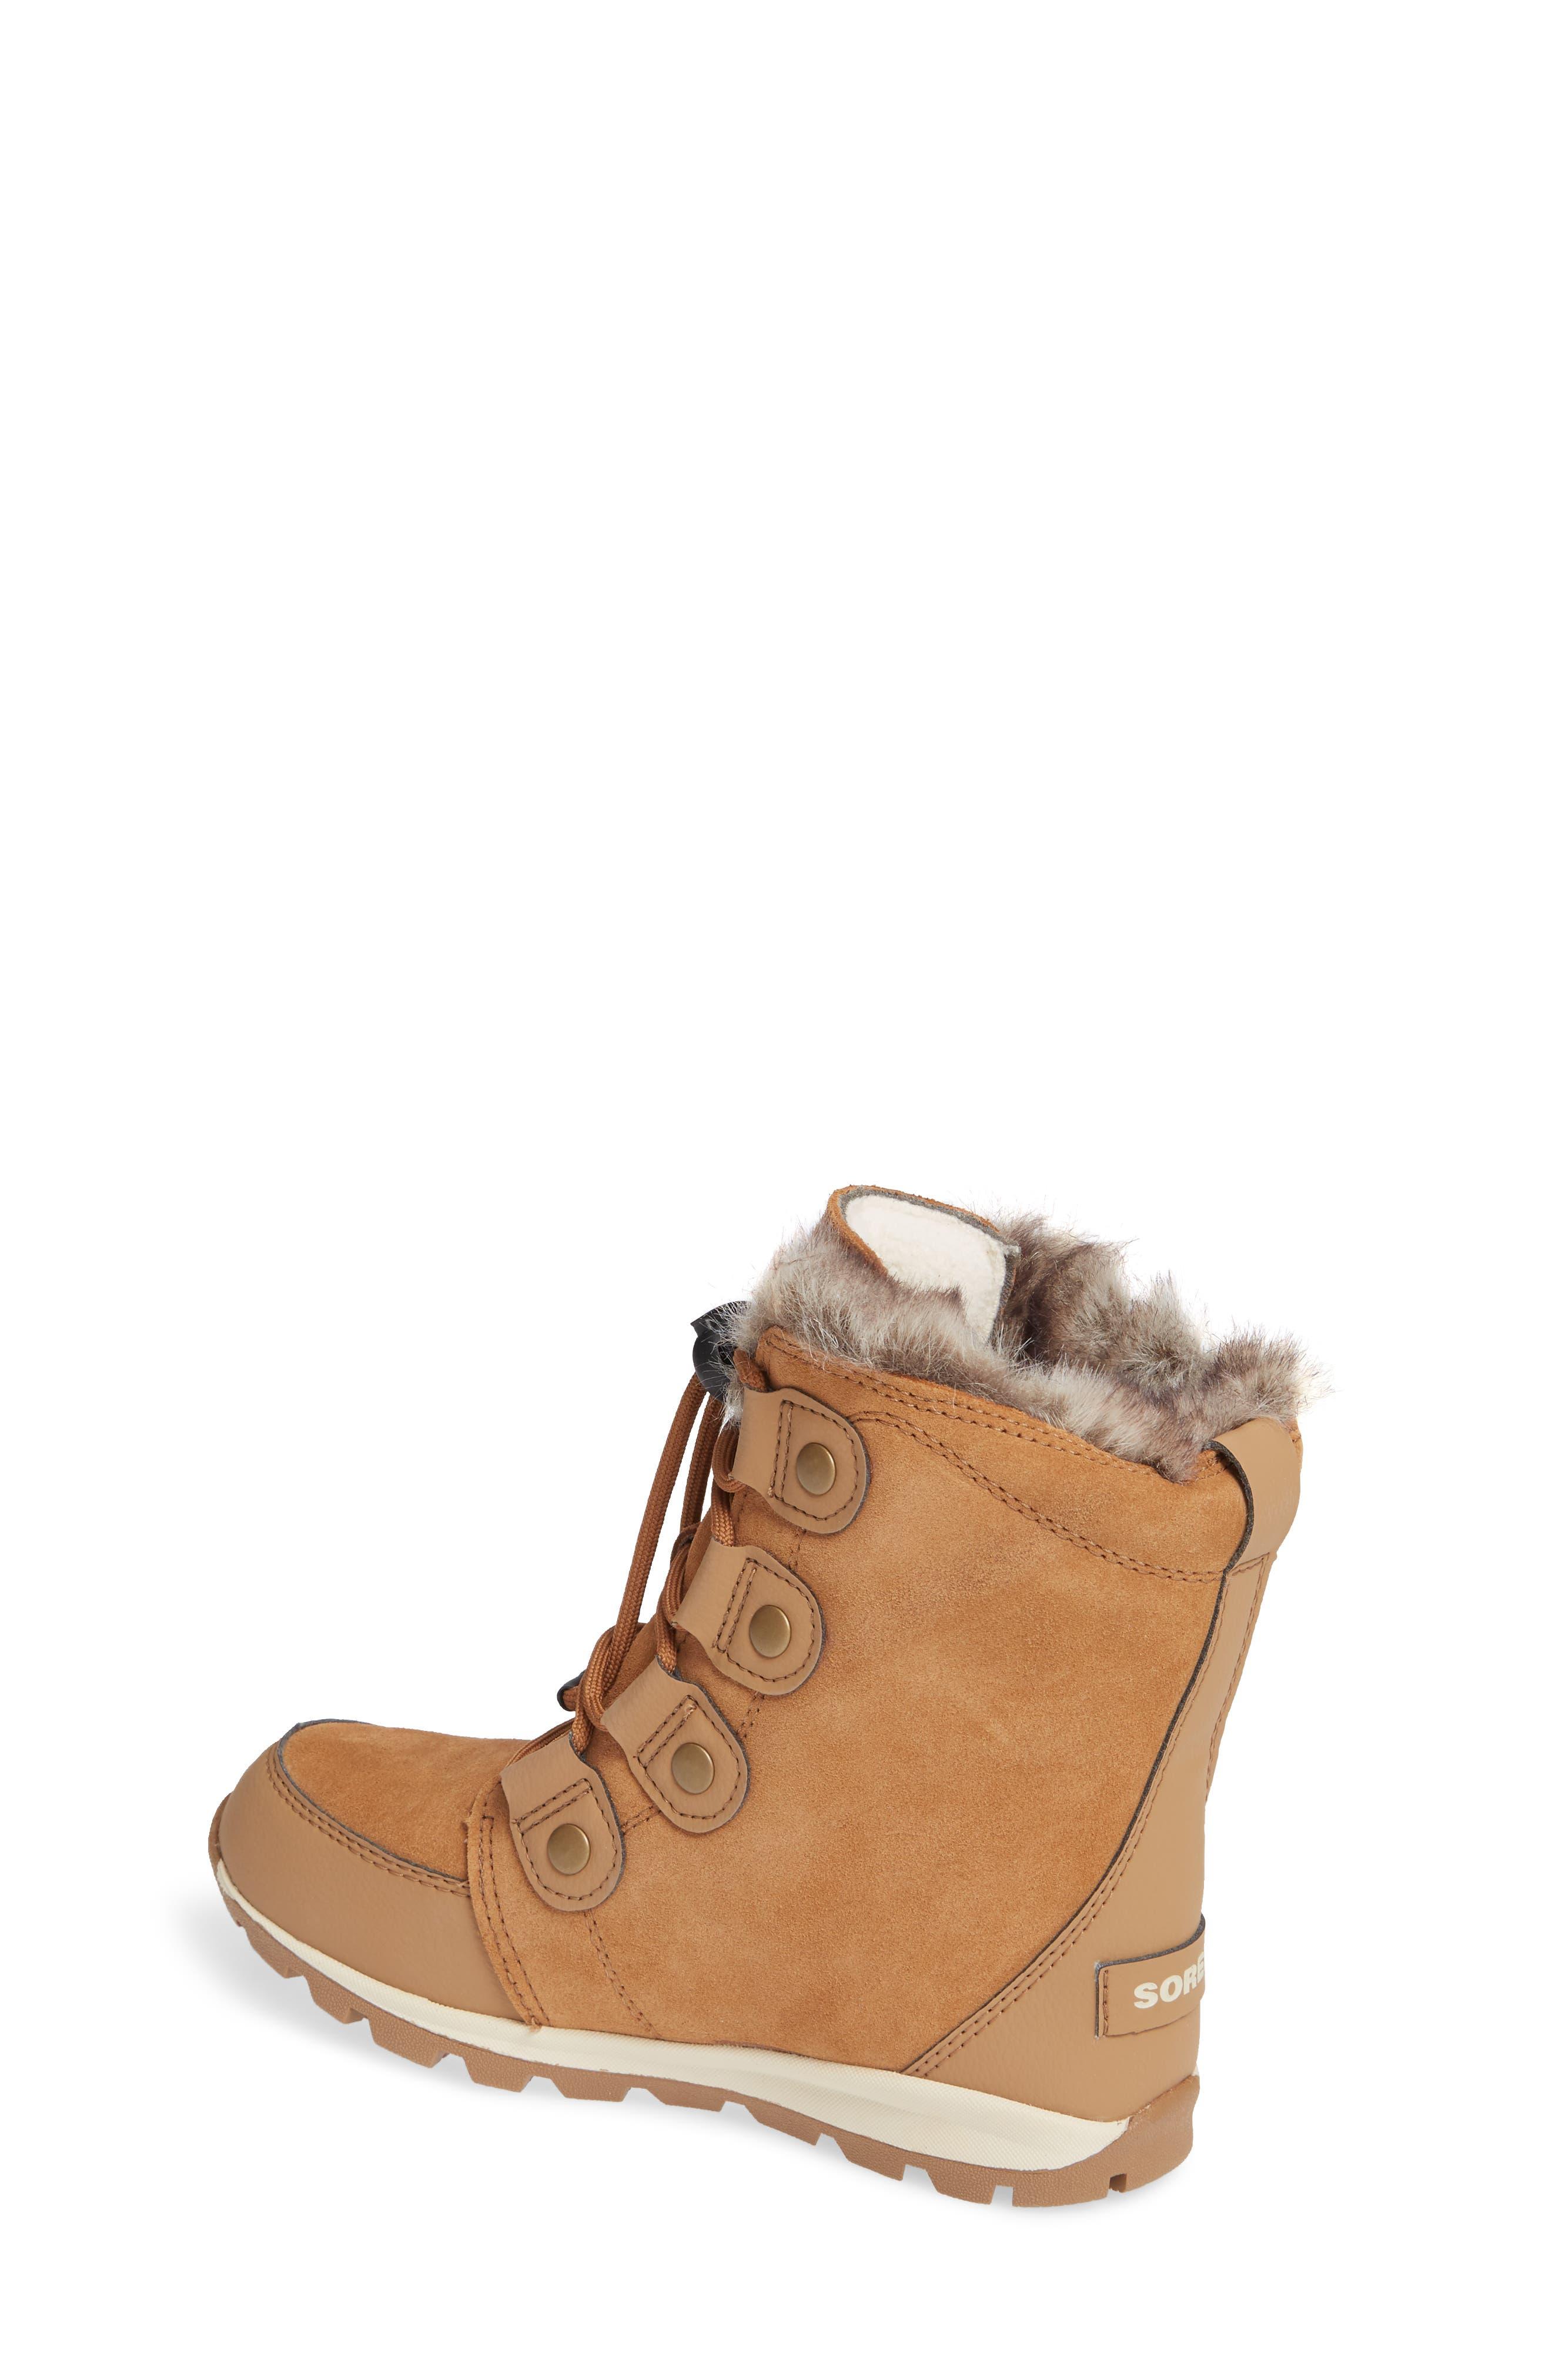 Whitney Suede Waterproof Faux Fur Boot,                             Alternate thumbnail 2, color,                             ELK/ NATURAL